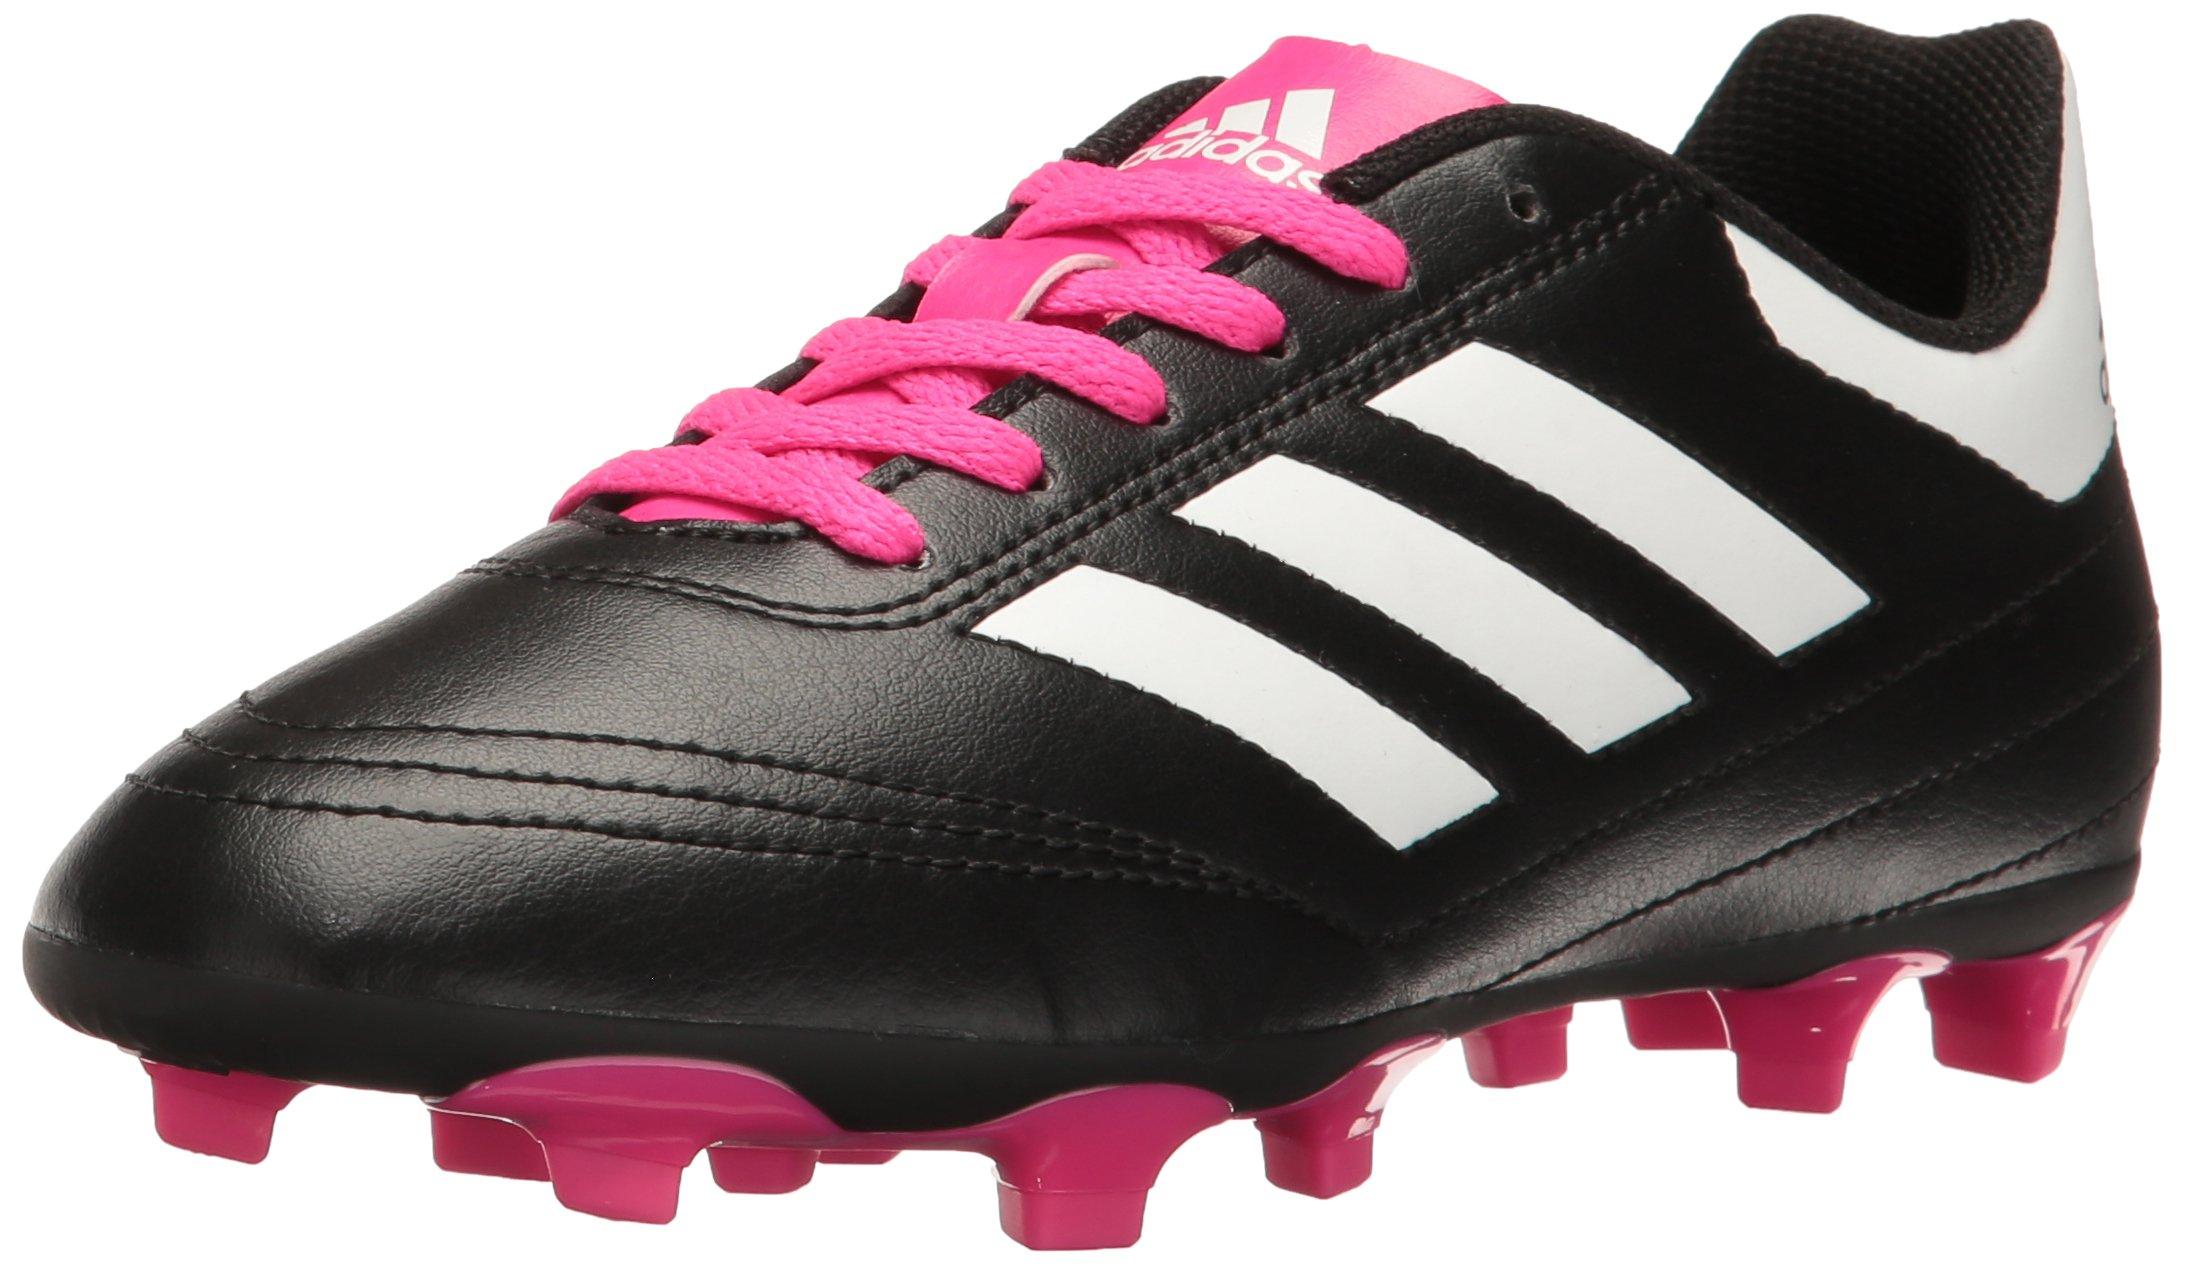 adidas Performance Kids' Goletto VI J Firm Ground Soccer Cleats, Black/White/Shock Pink, 12 Medium US Little Kid